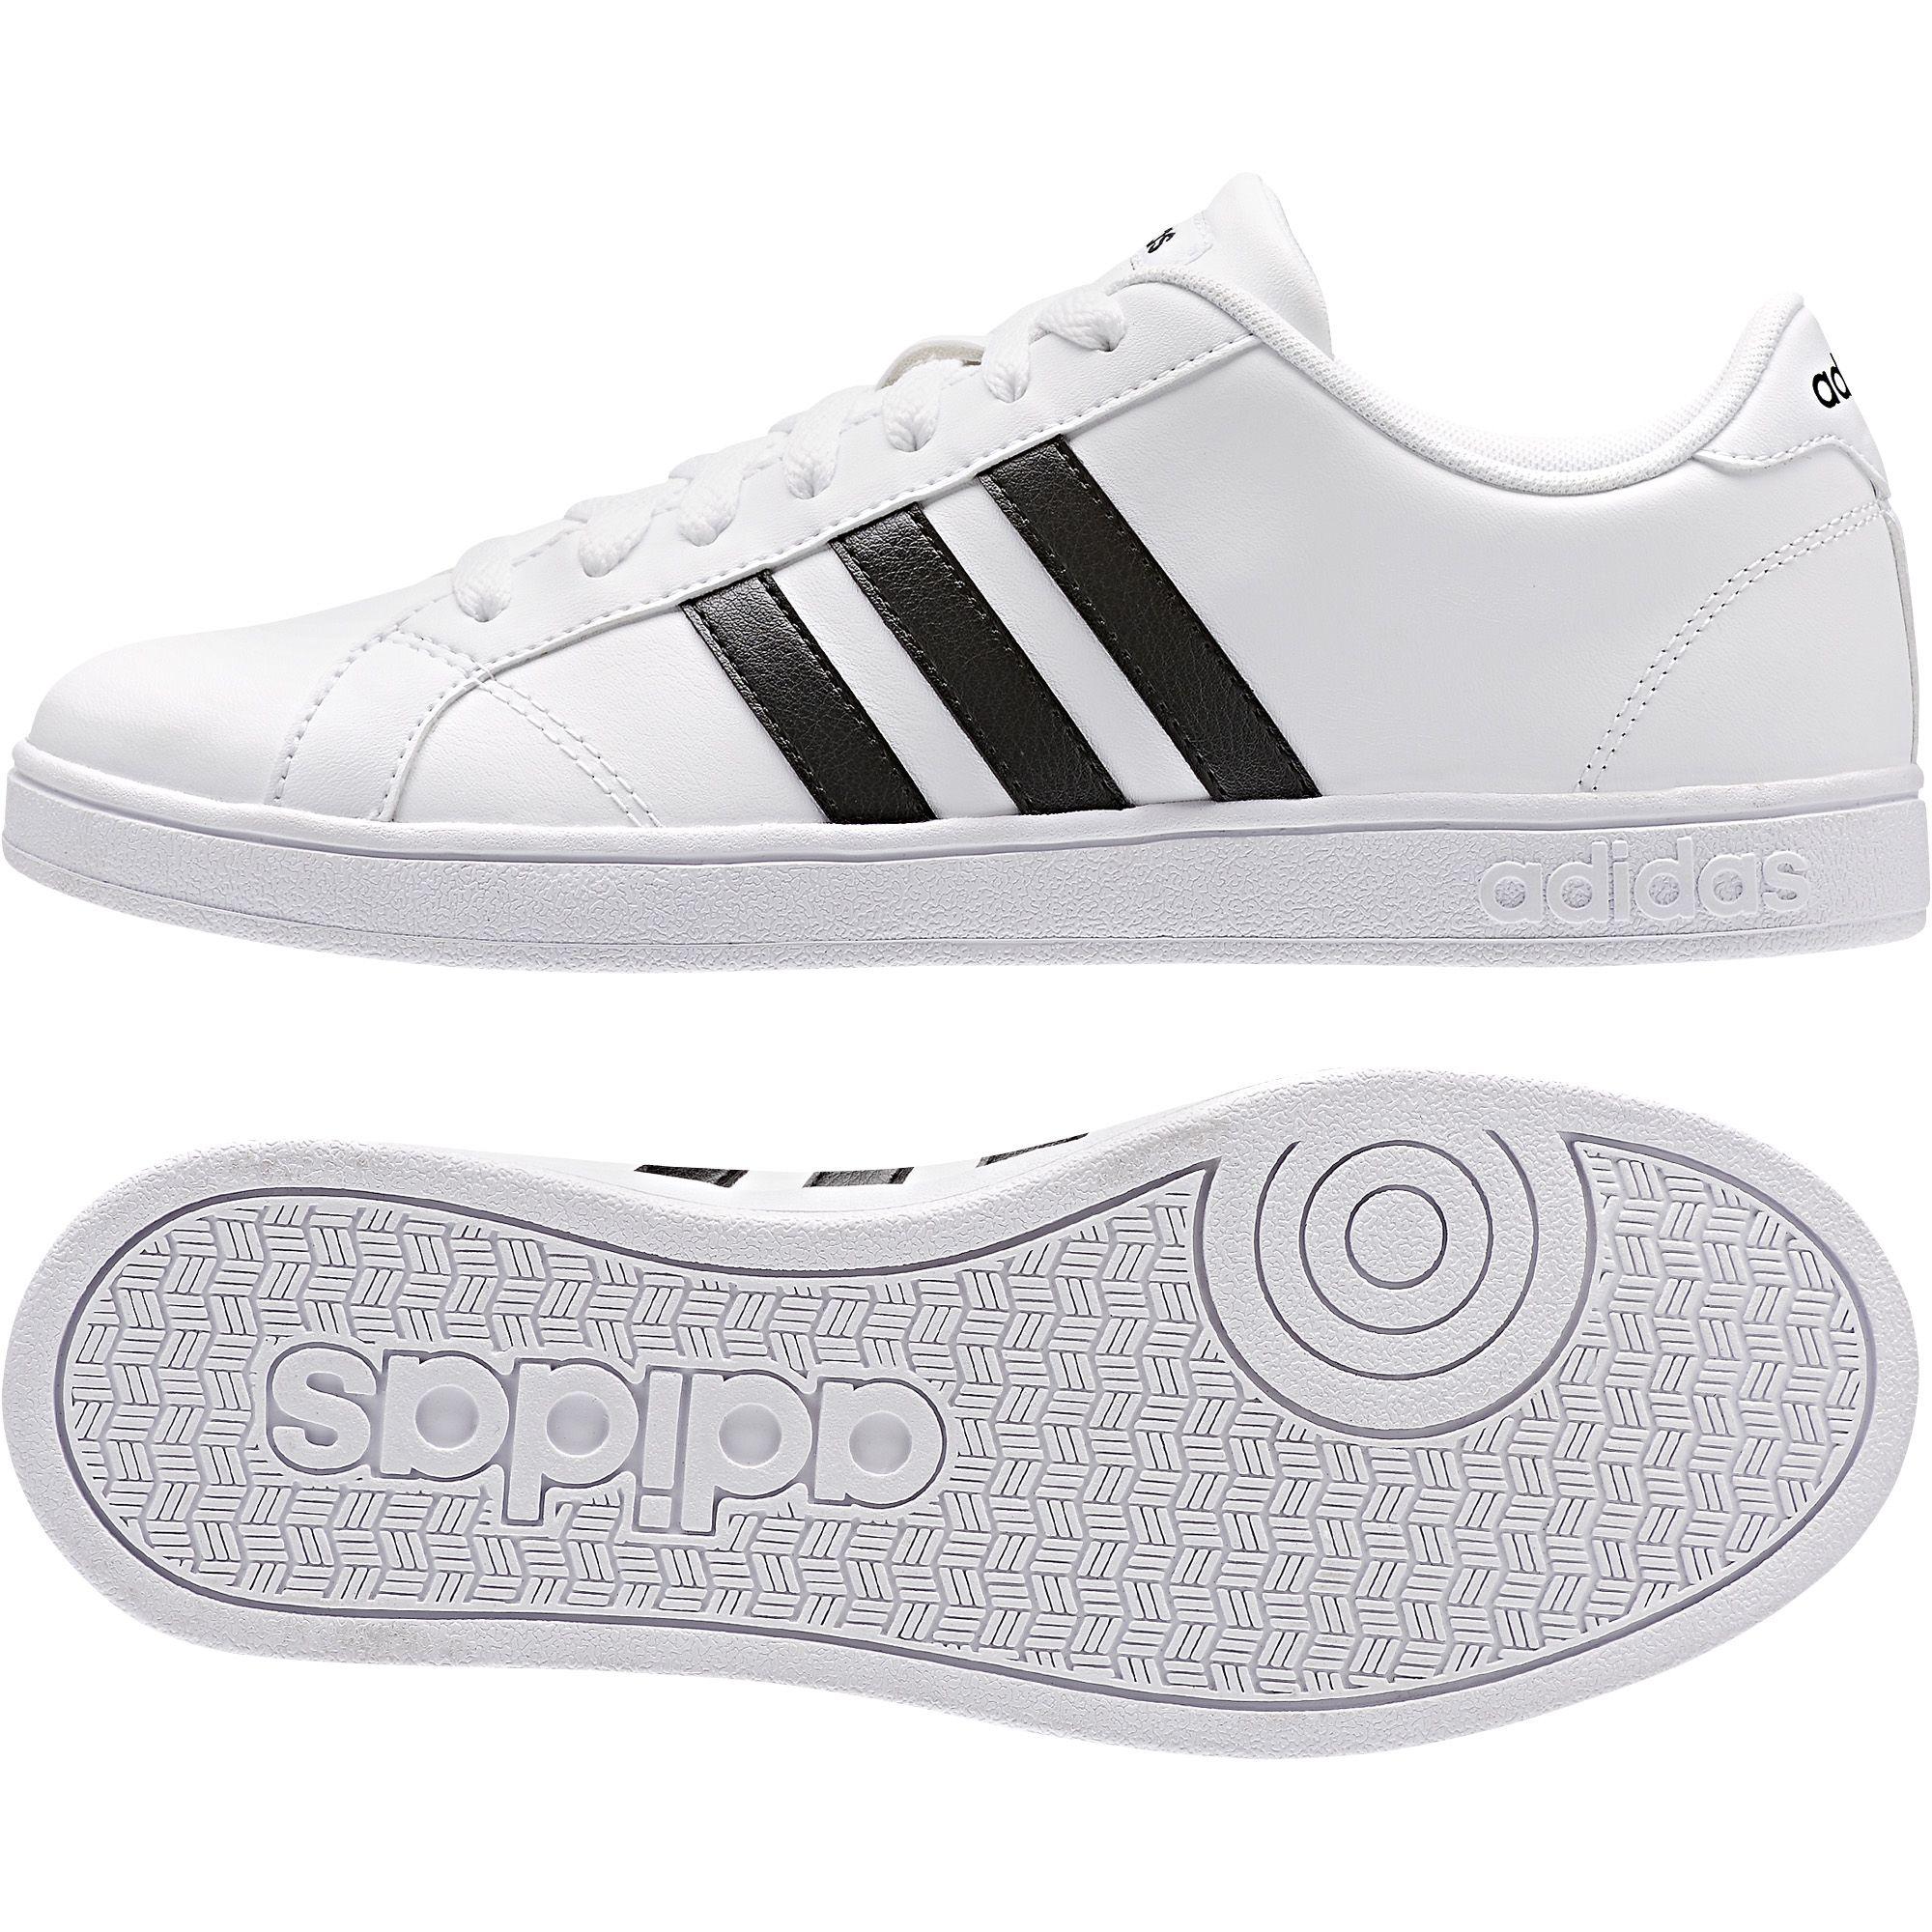 adidas Neo Women's Baseline Casual Sport Shoe - White/Black